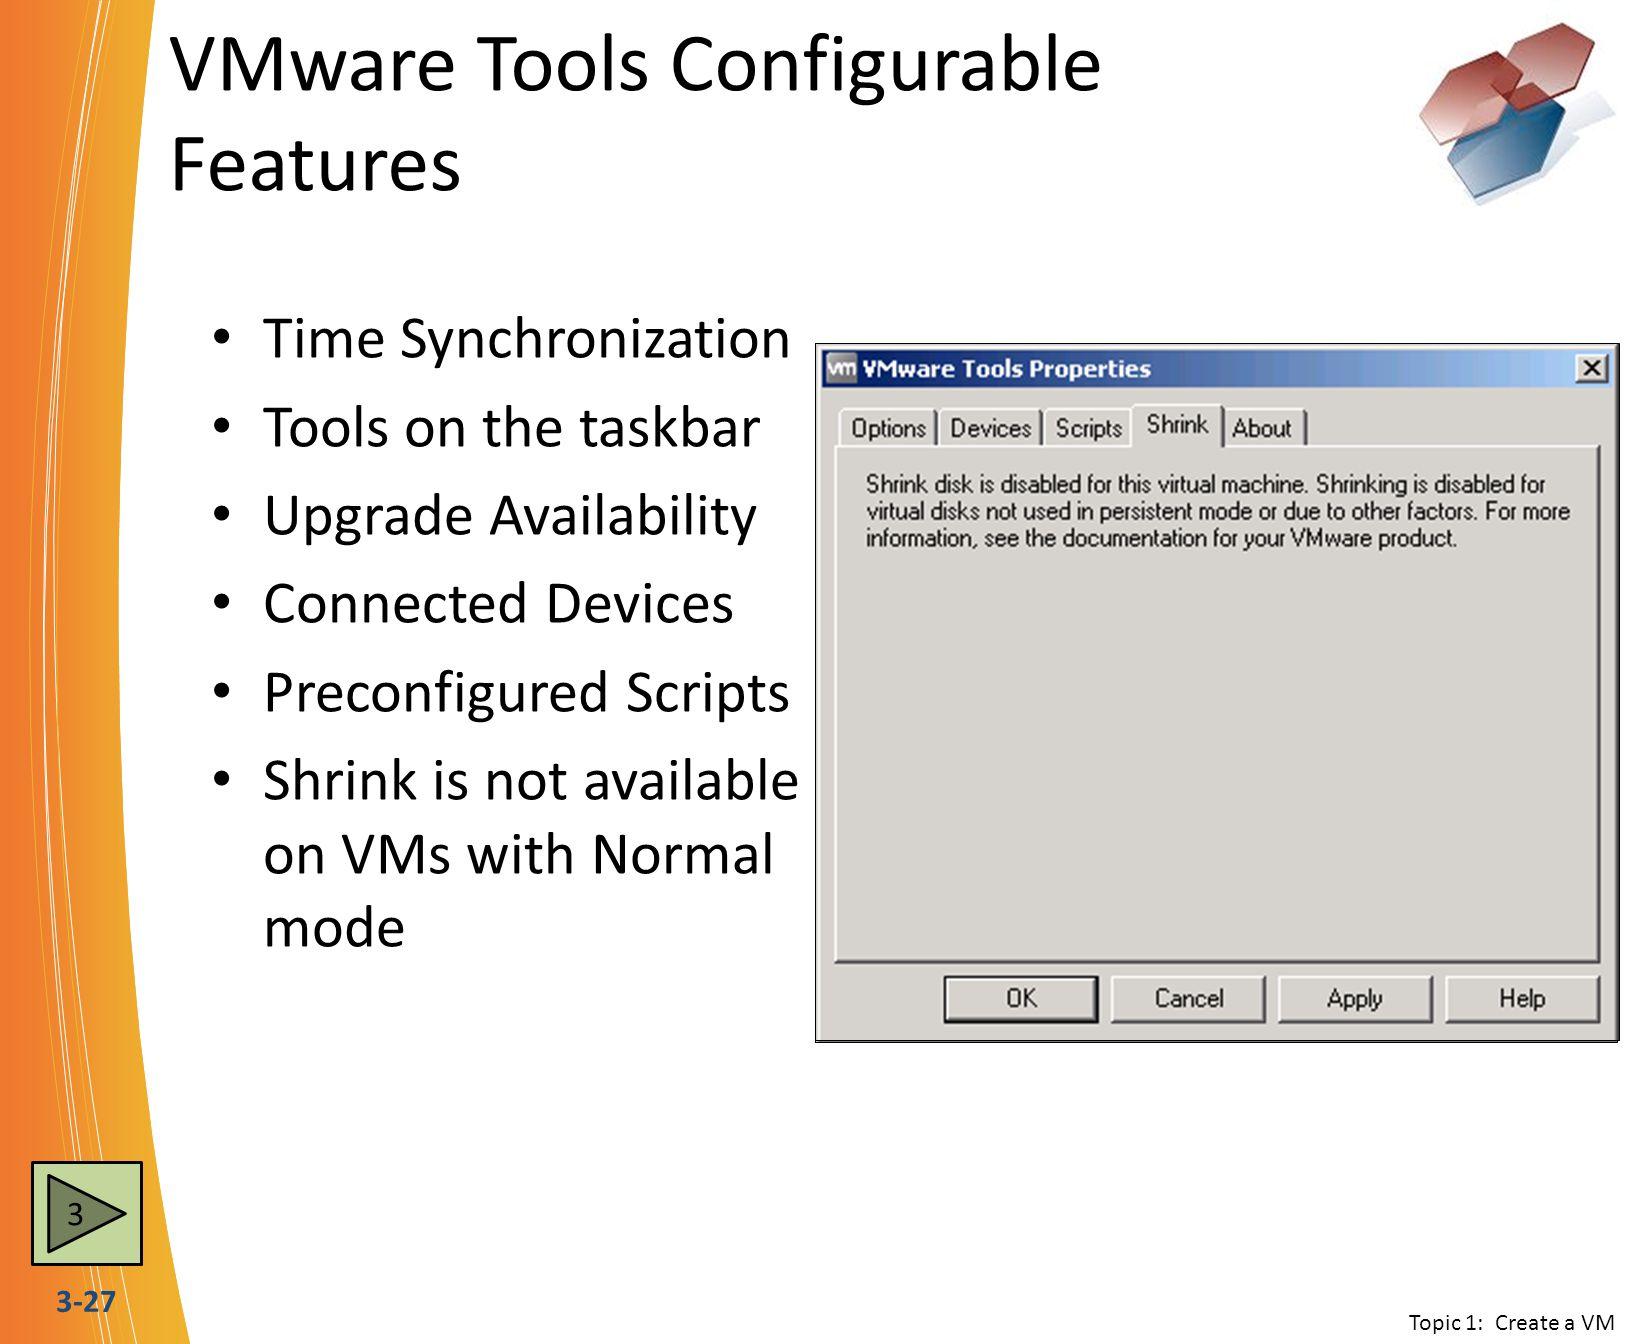 VMware Tools Configurable Features